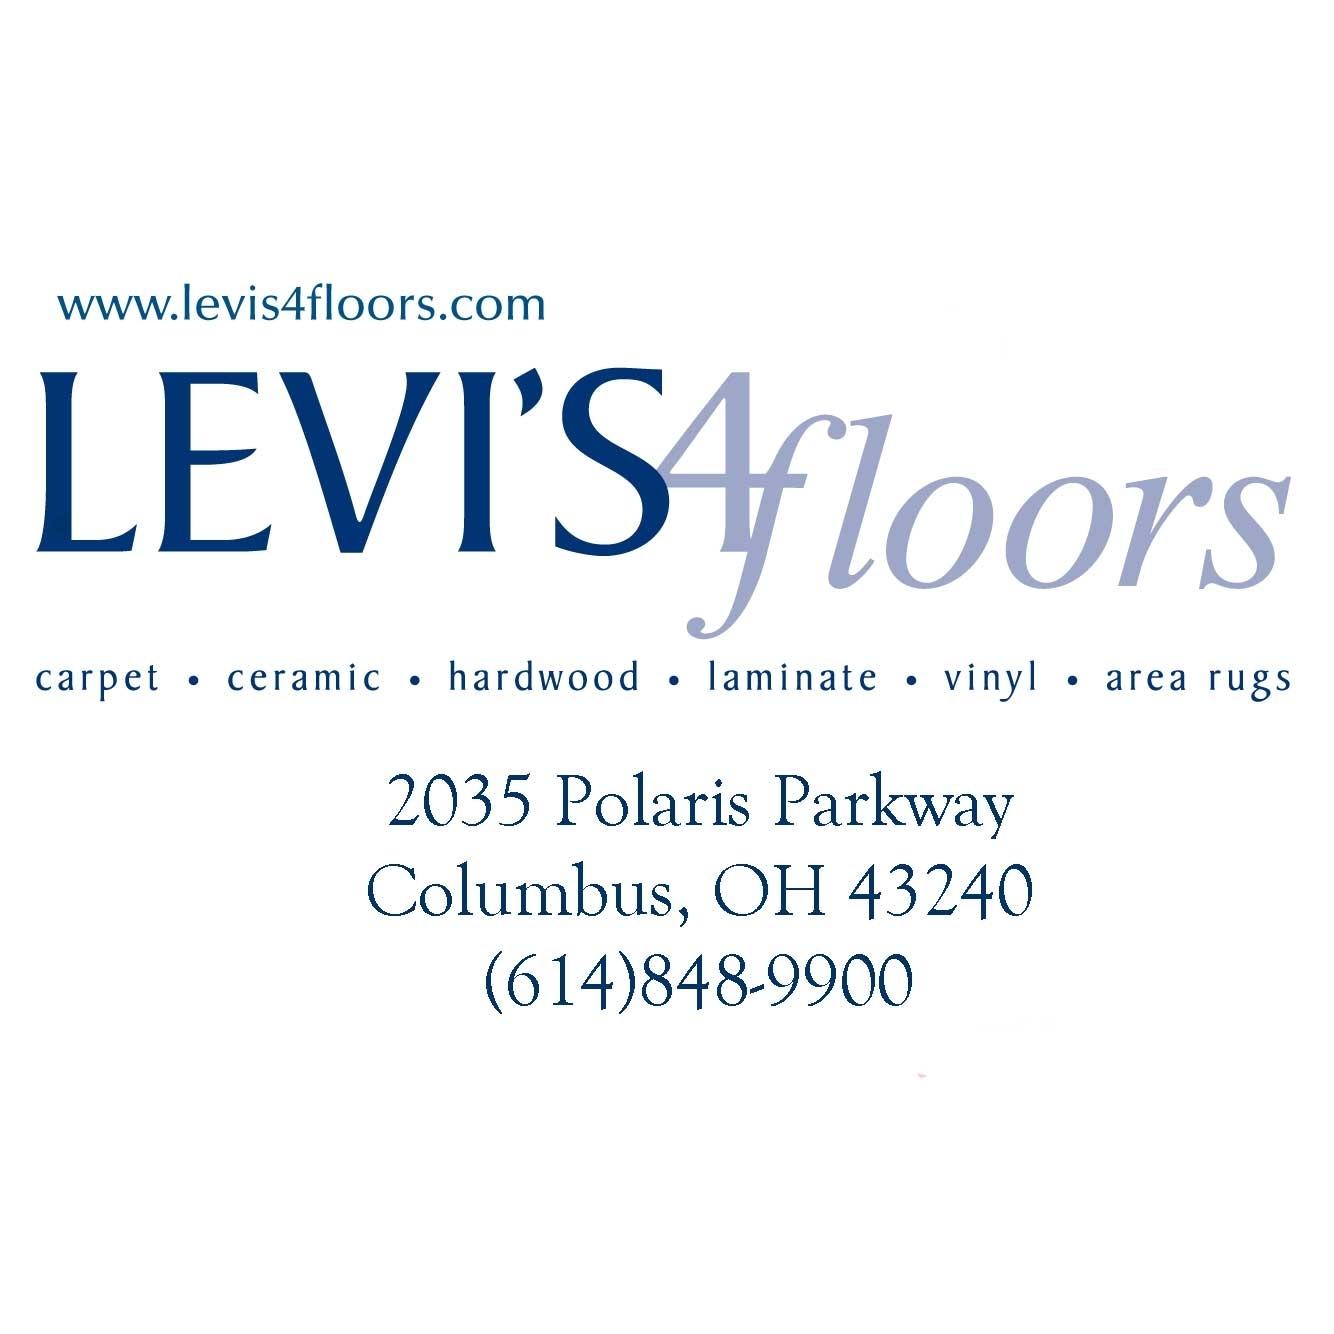 Levi's 4 Floors image 6